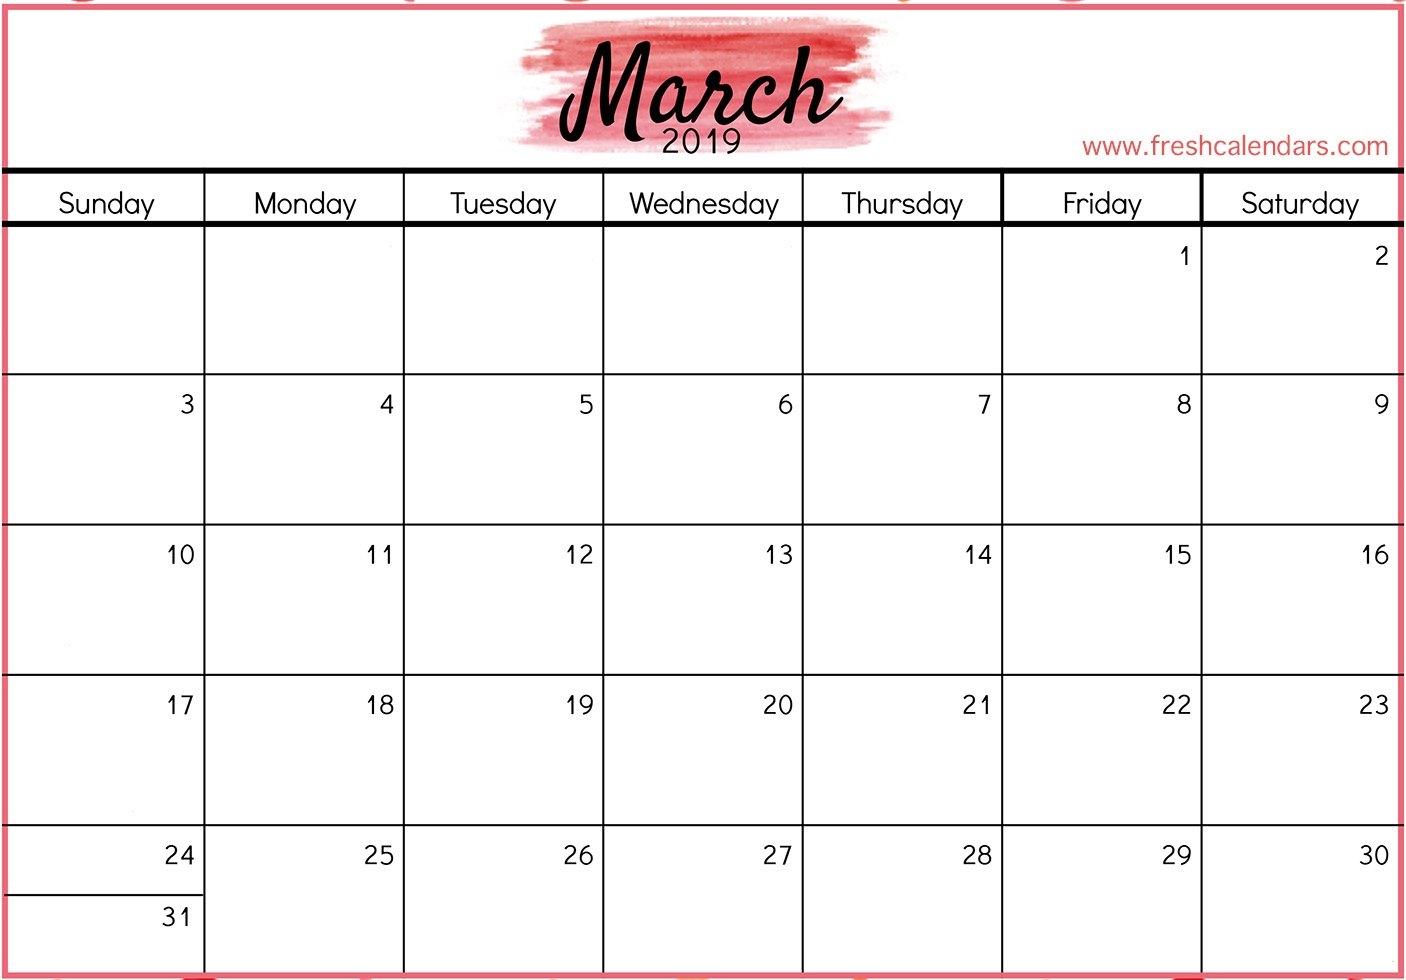 March 2019 Printable Calendars - Fresh Calendars Calendar Of 2019 March